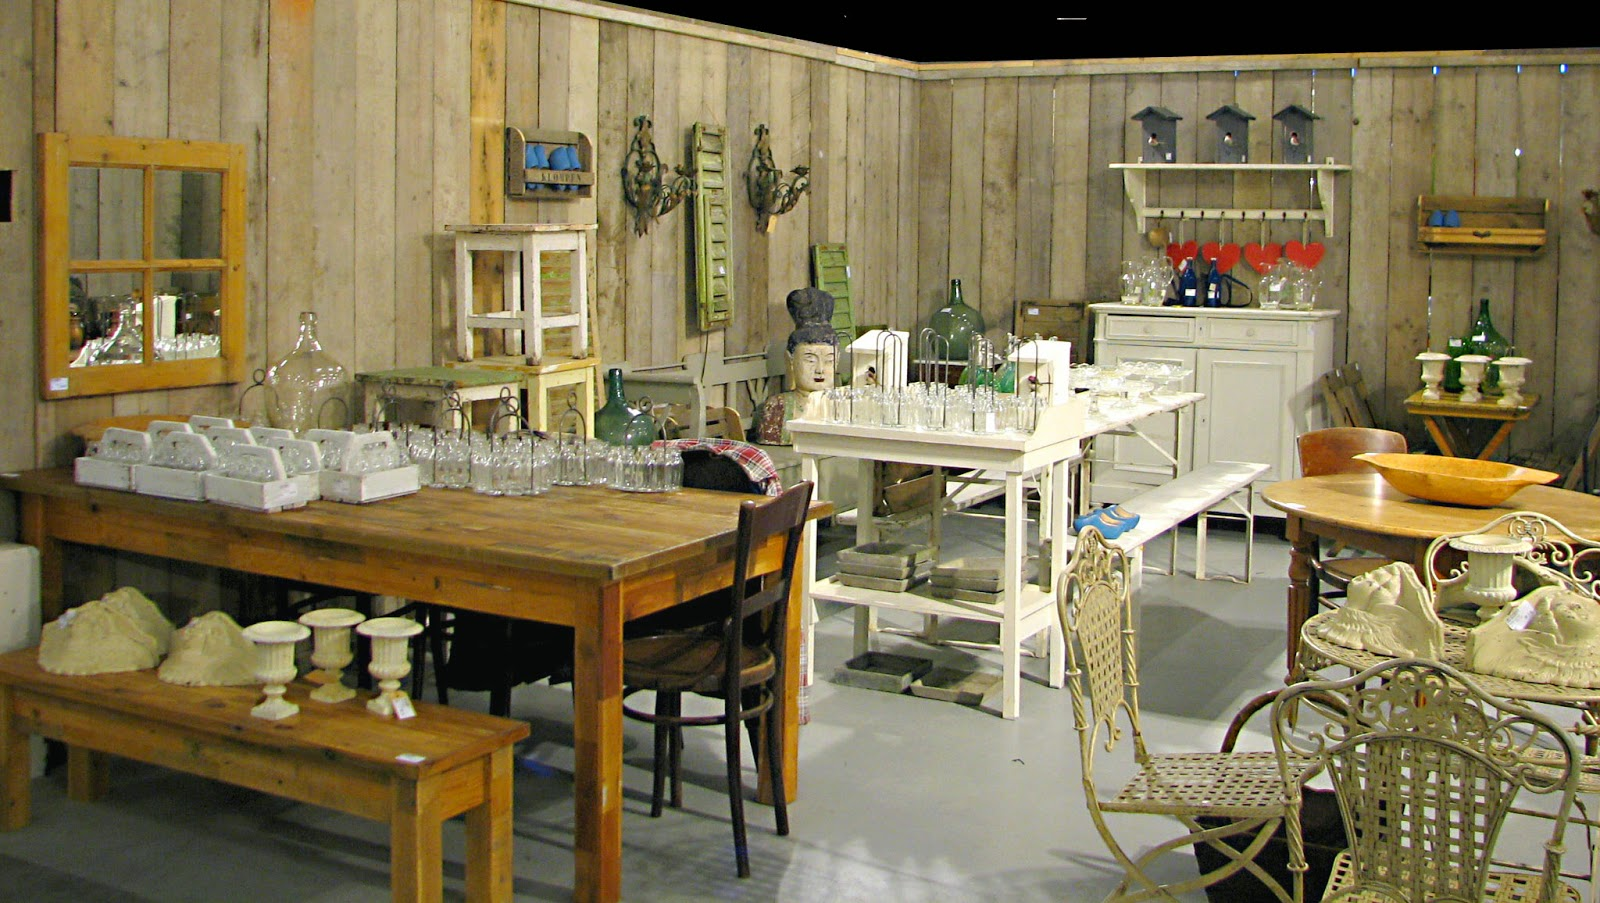 Landelijke meubels brocante meubels for Brocante meubels